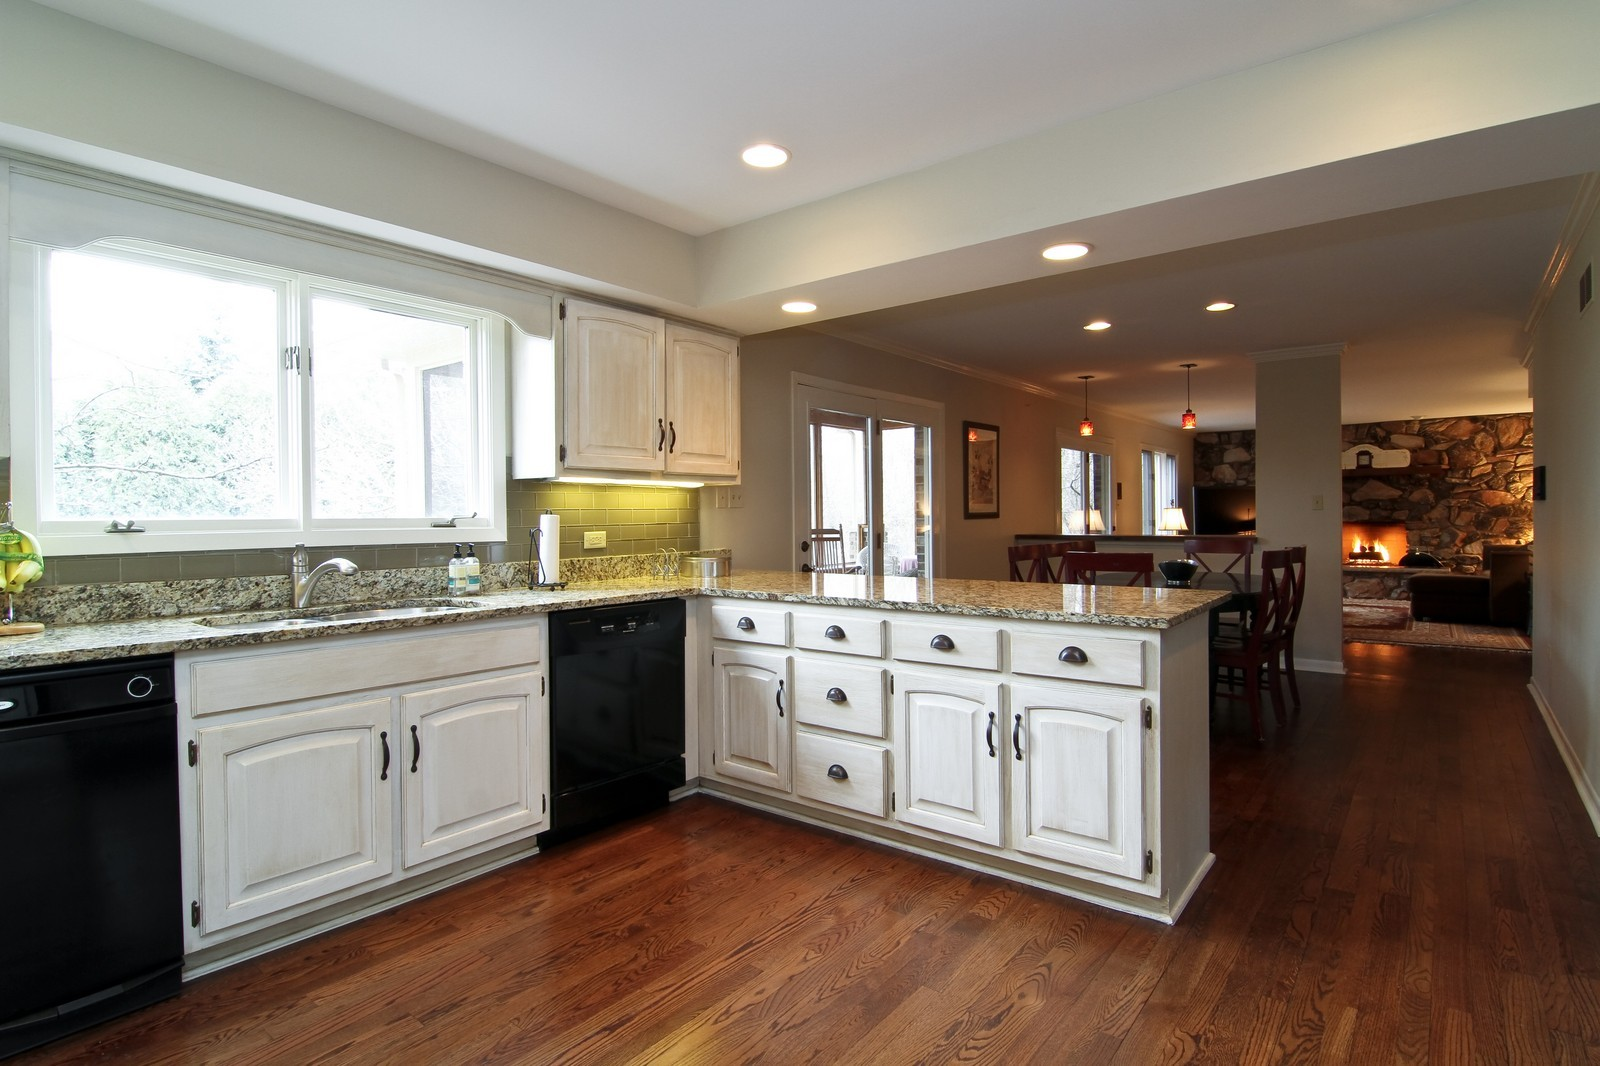 Real Estate Photography - 11554 Ridgewood Lane, Burr Ridge, IL, 60527 - Kitchen / Breakfast Room